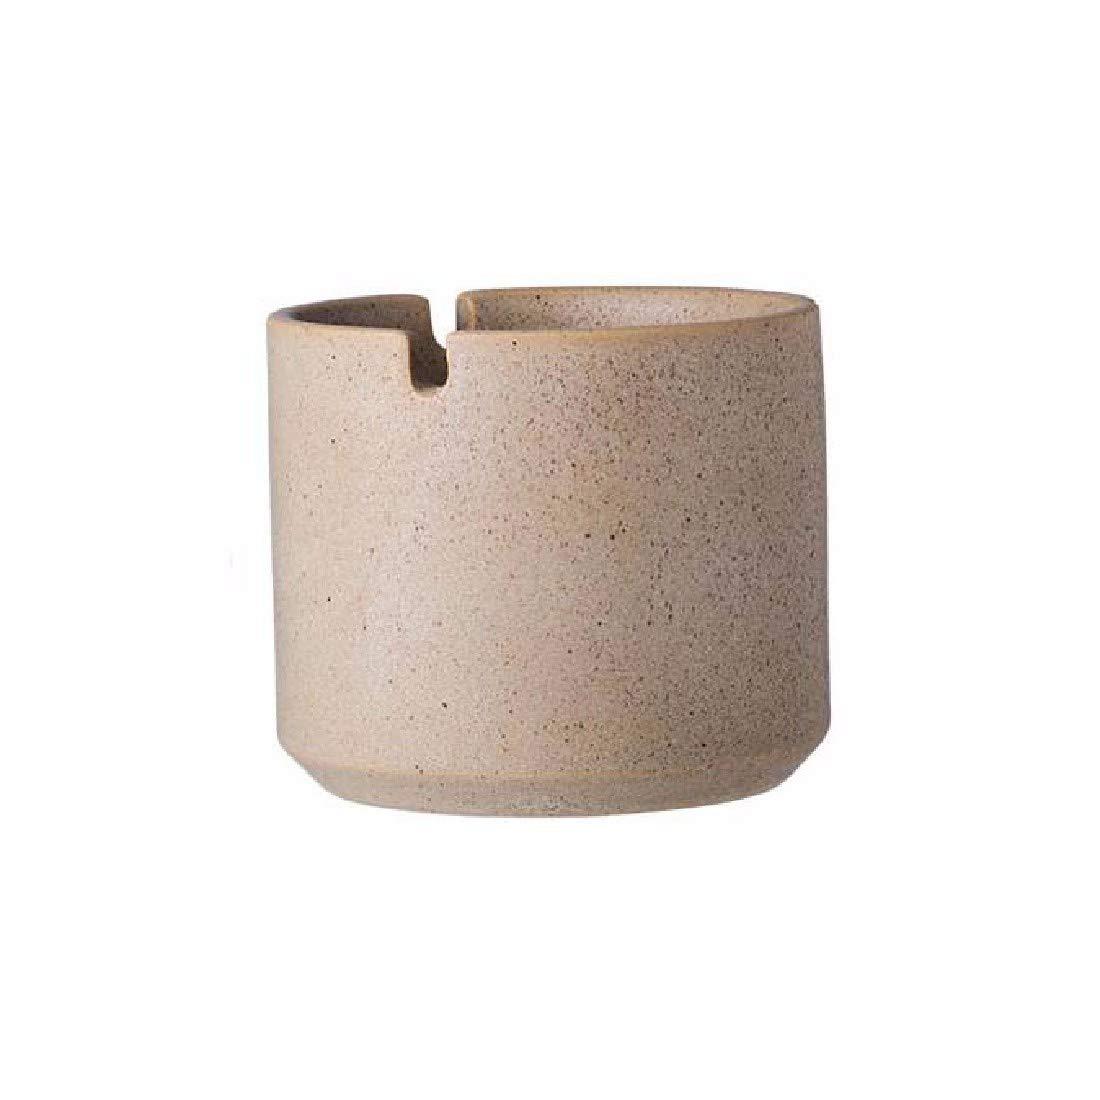 ZPSPZ ZPSPZ ZPSPZ cenicero Retro cenicero cenicero de cerámica casa Oficina Multifuncional de Gran Escala,Verde 04379e